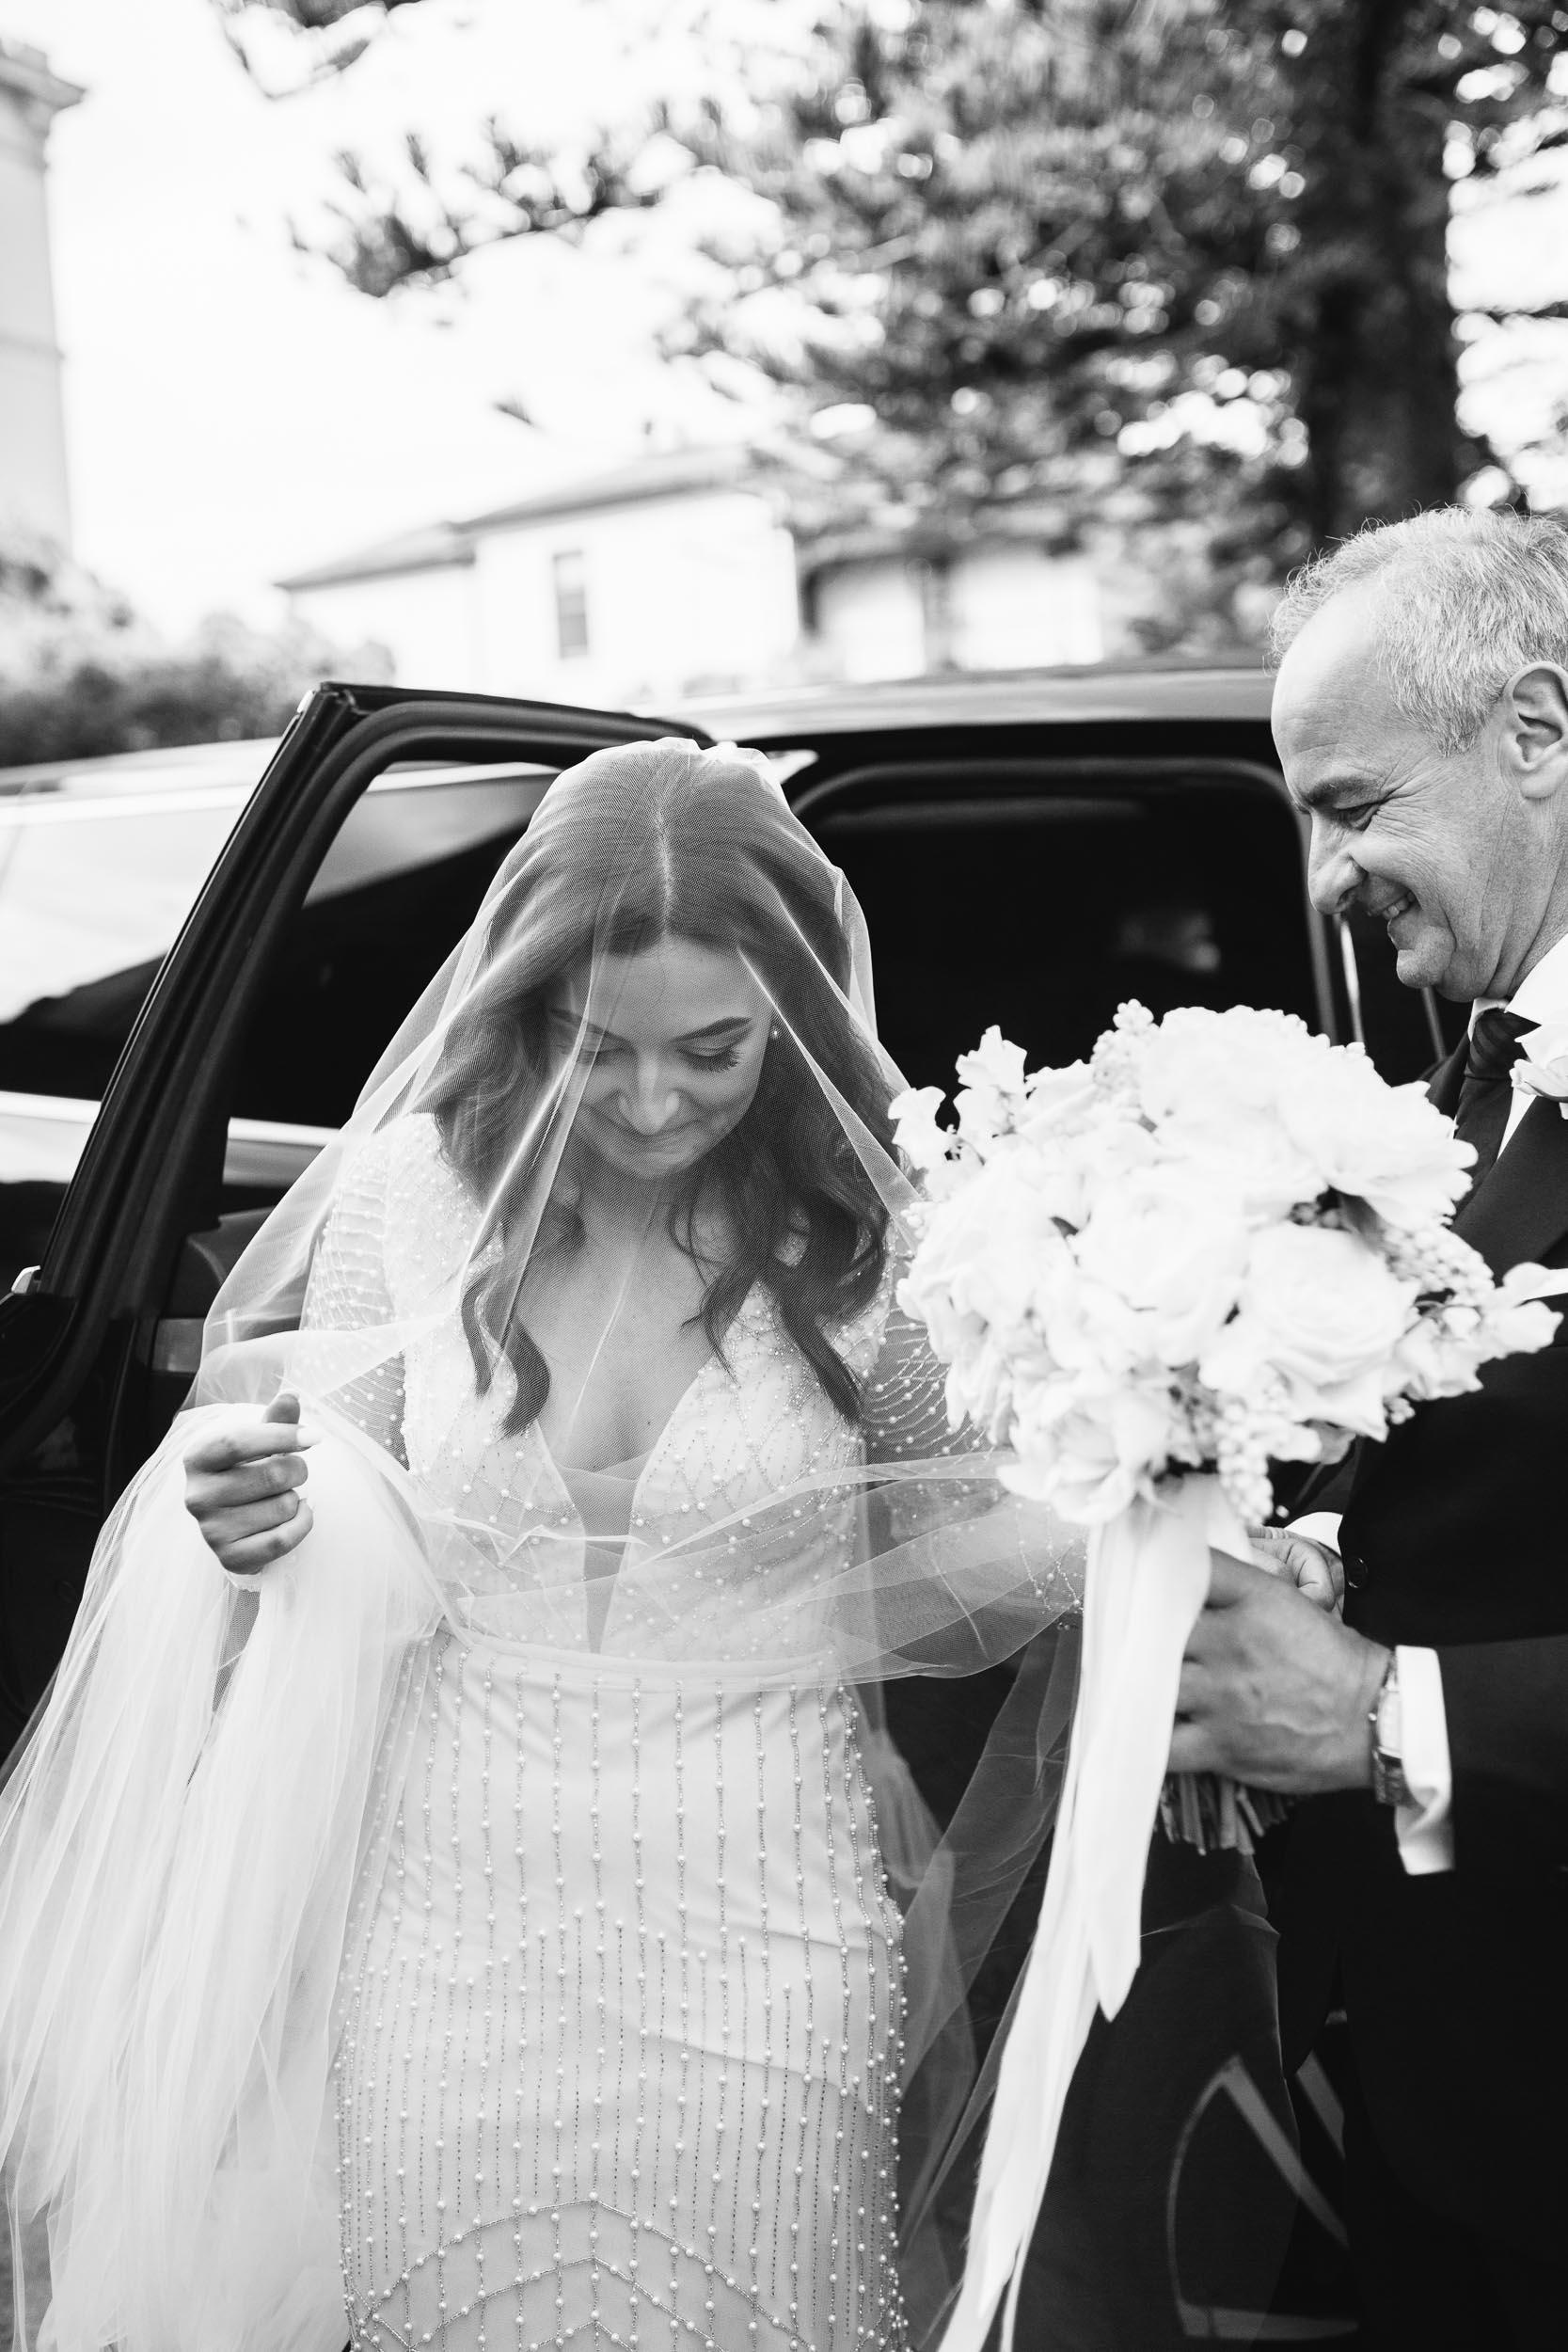 Kas-Richards-Wedding-Photographer-Melbourne-City-Wedding-Alto-Event-Space-Jane-Hill-Bridal-Gown-23.jpg